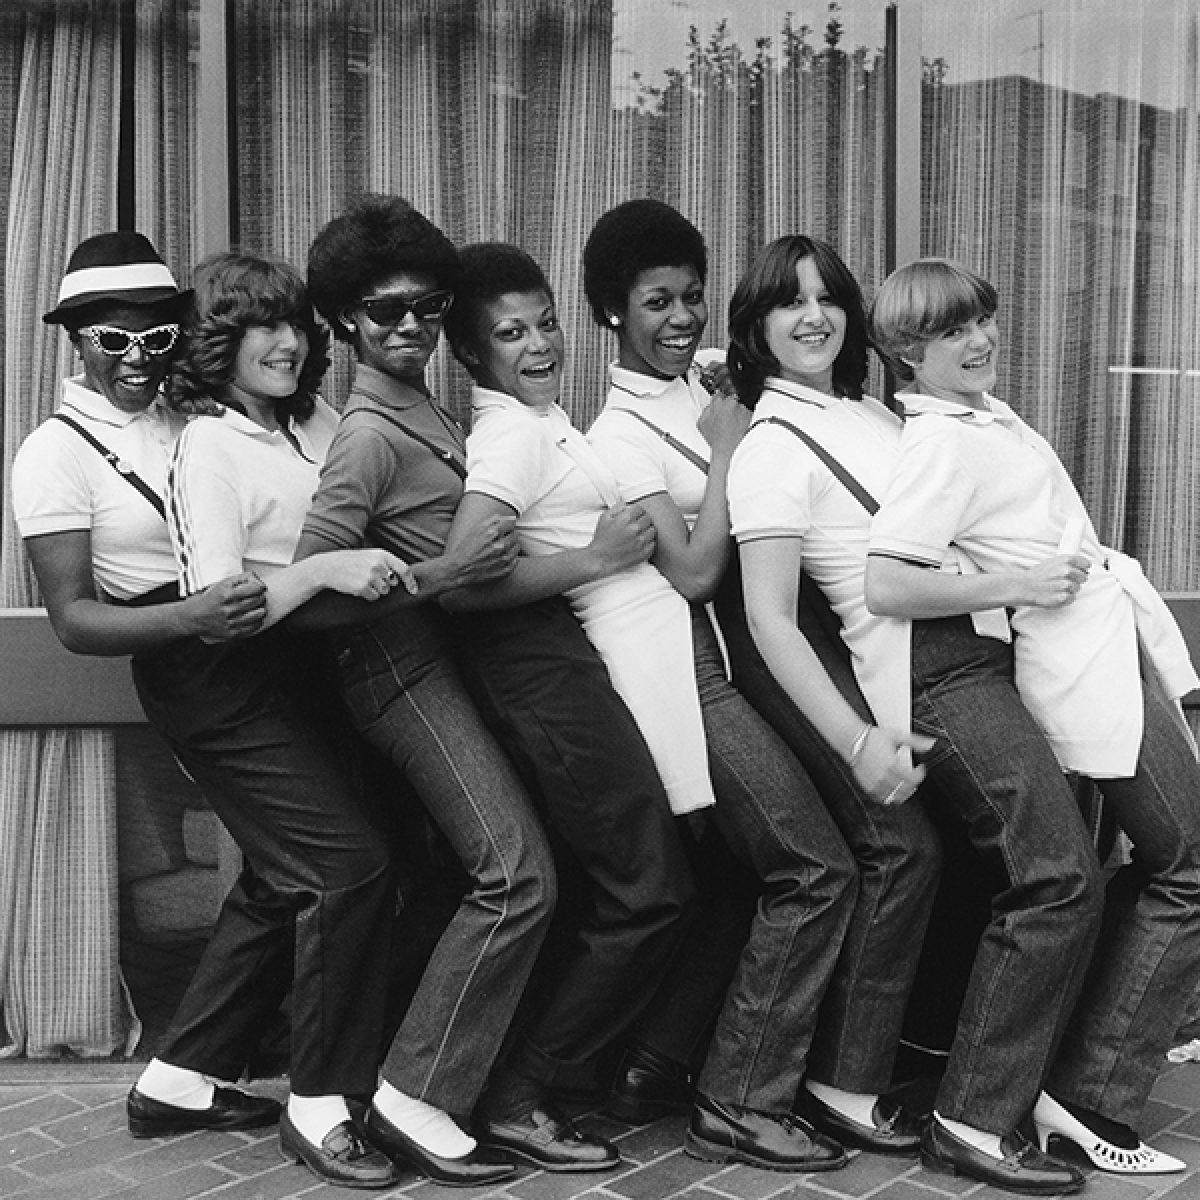 Ska Girls. Taken outside Friars, Aylesbury, 1980.